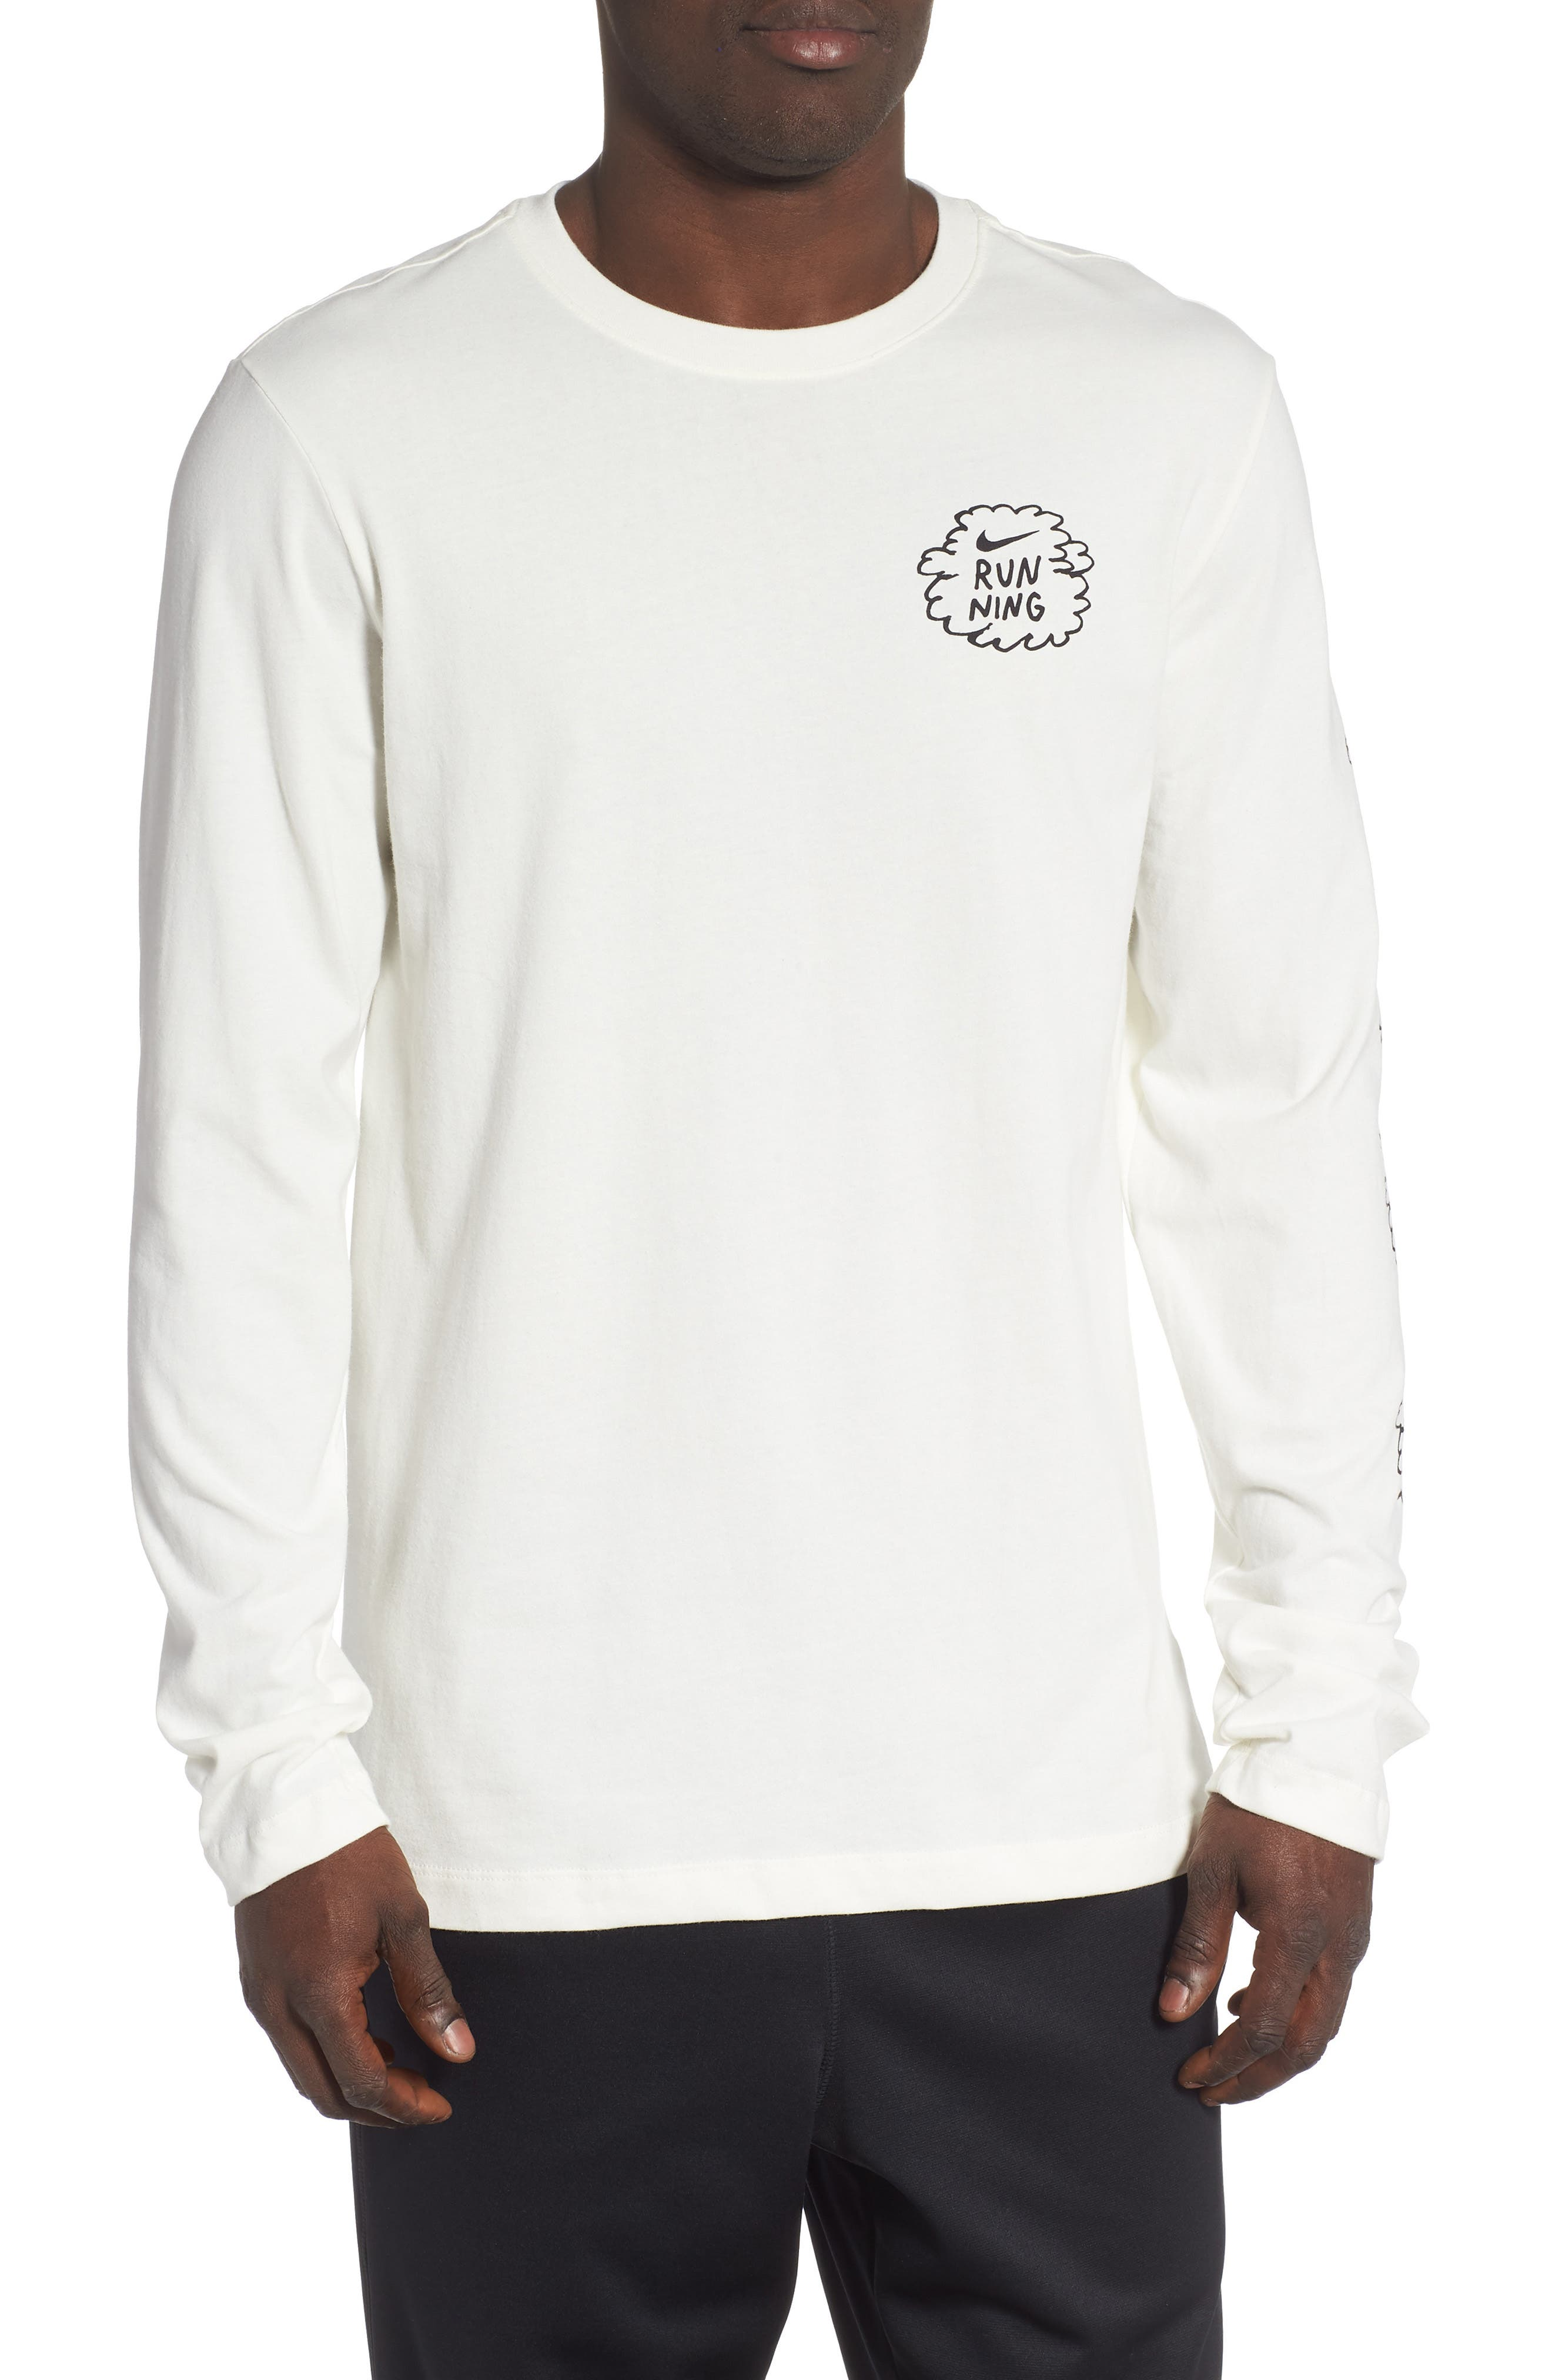 Nike Dry Long Sleeve Running T-Shirt